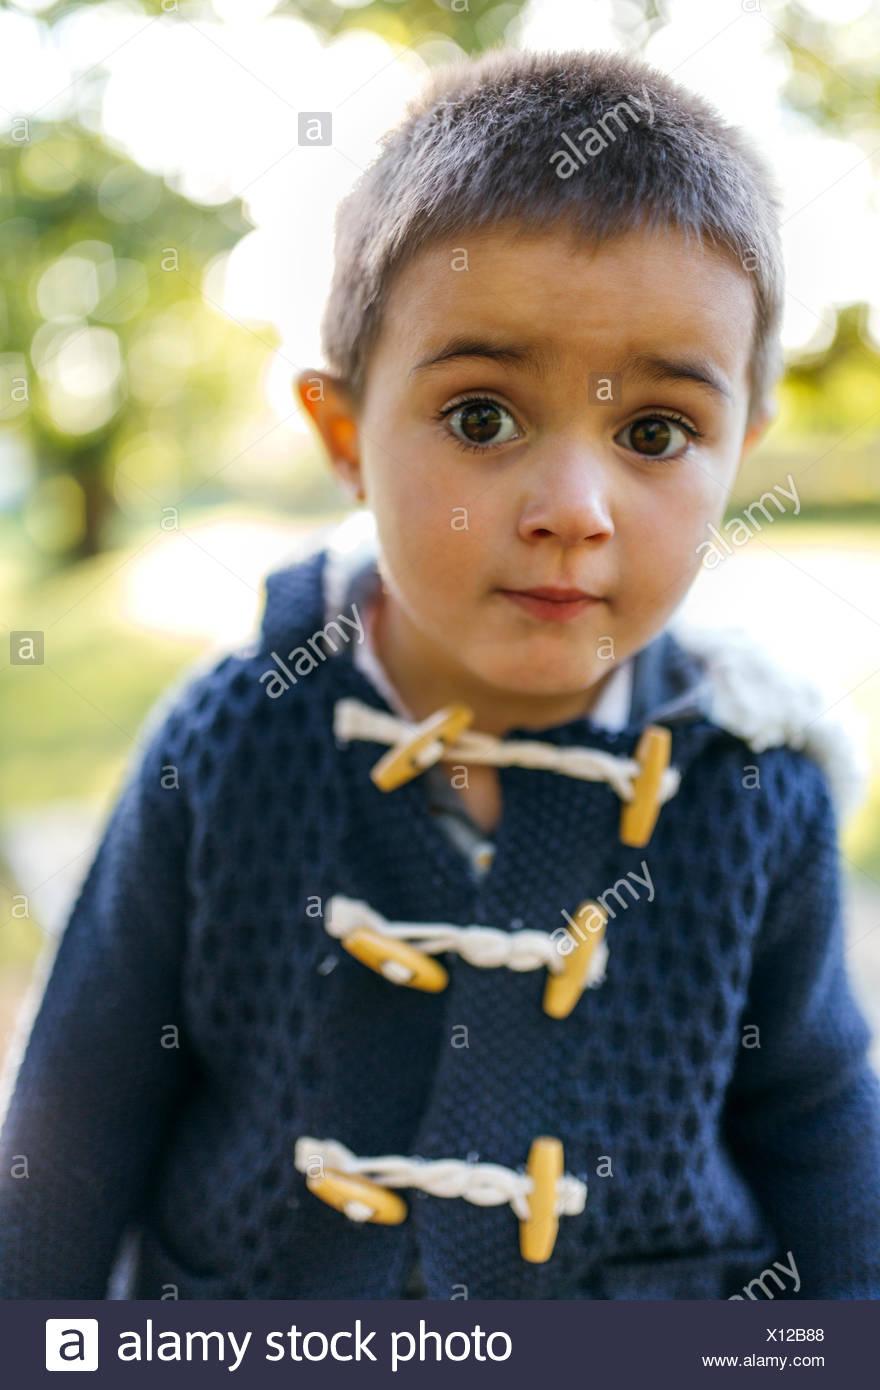 Portrait of little boy with eyes wide open - Stock Image